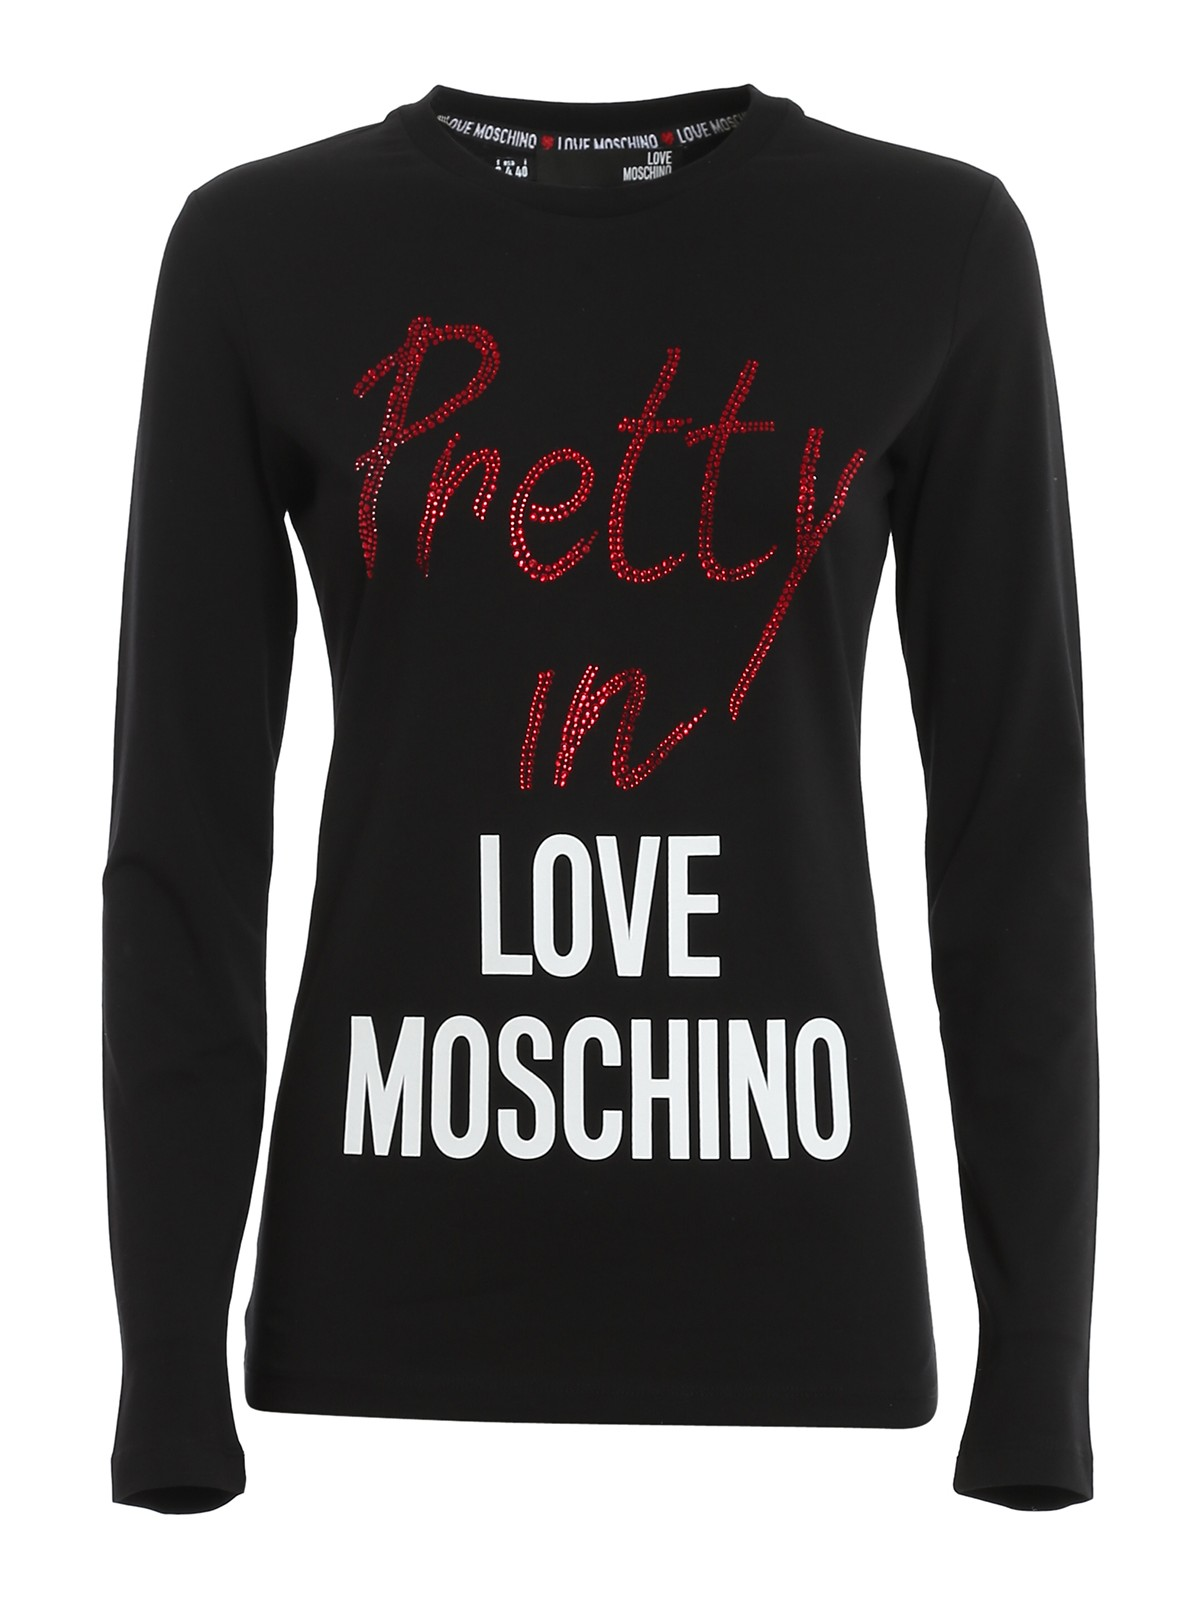 LOVE MOSCHINO PRETTY EMBELLISHED T-SHIRT